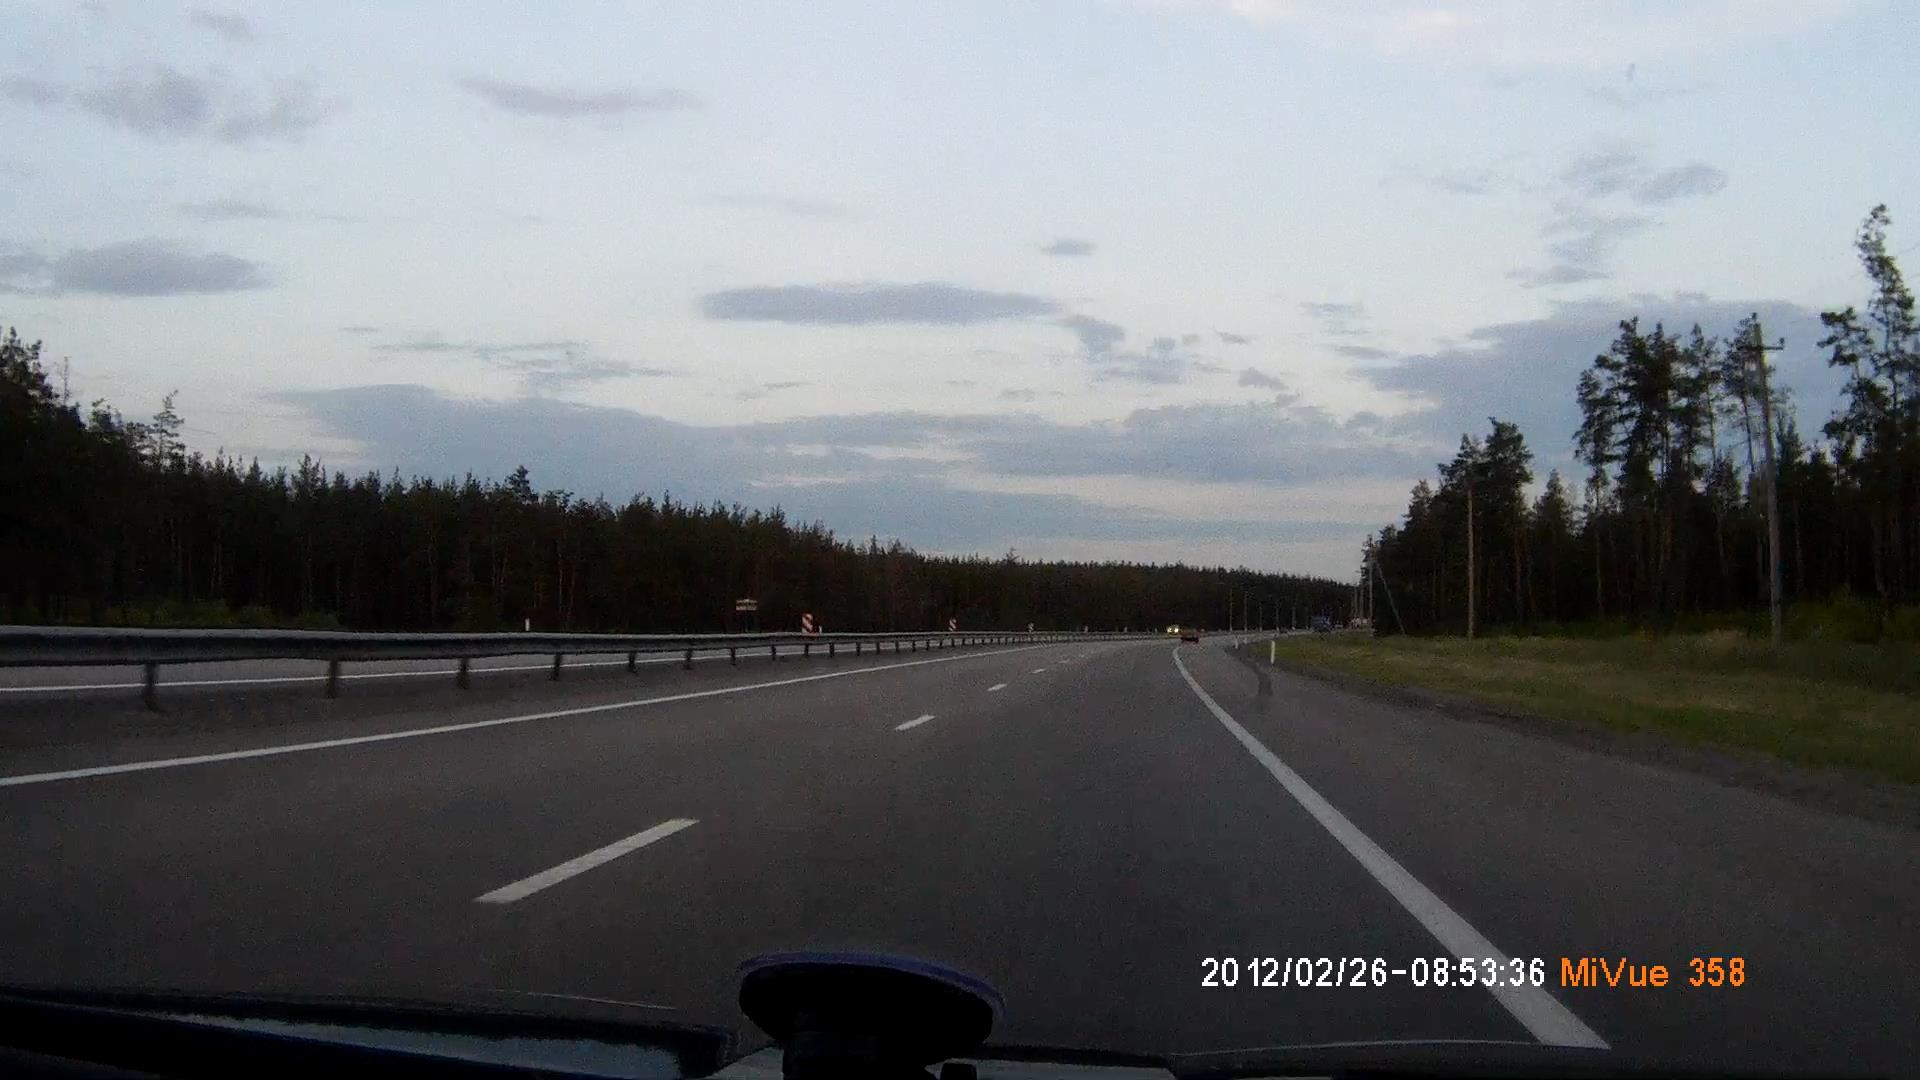 http://se.uploads.ru/FNumL.jpg